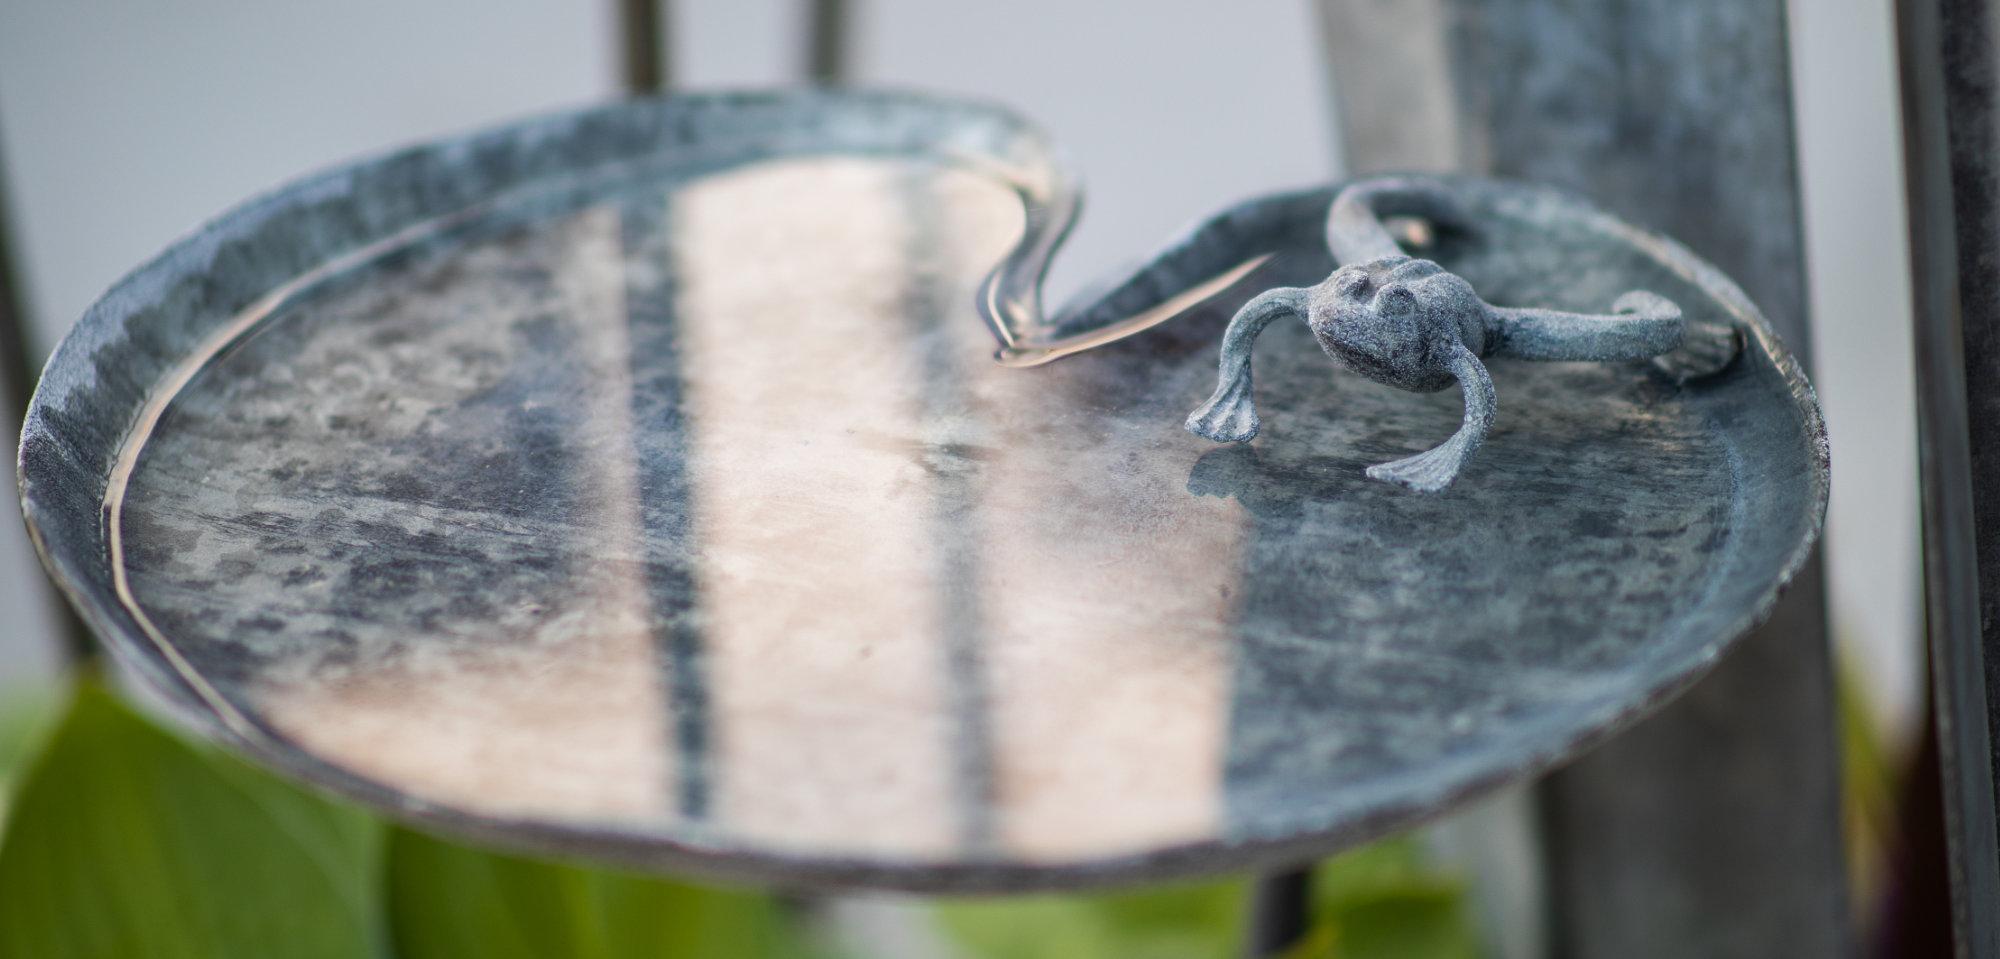 Frog Lily Pad Garden Bird Bath by Ian Gill Sculpture